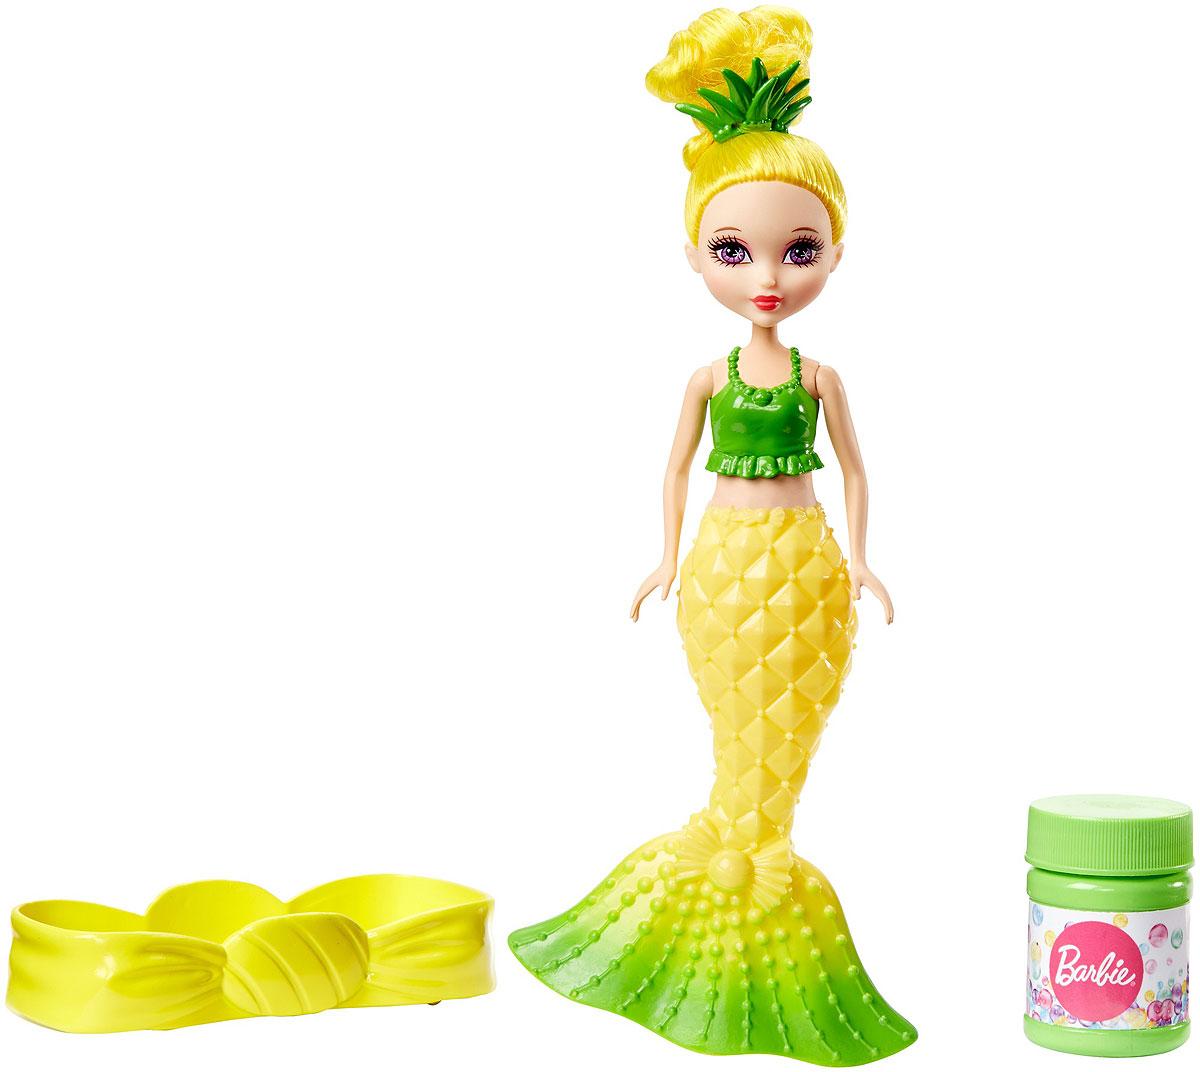 Barbie Мини-кукла Русалочка Ананас с мыльными пузырьками barbie коллекционная кукла natalia vodianova